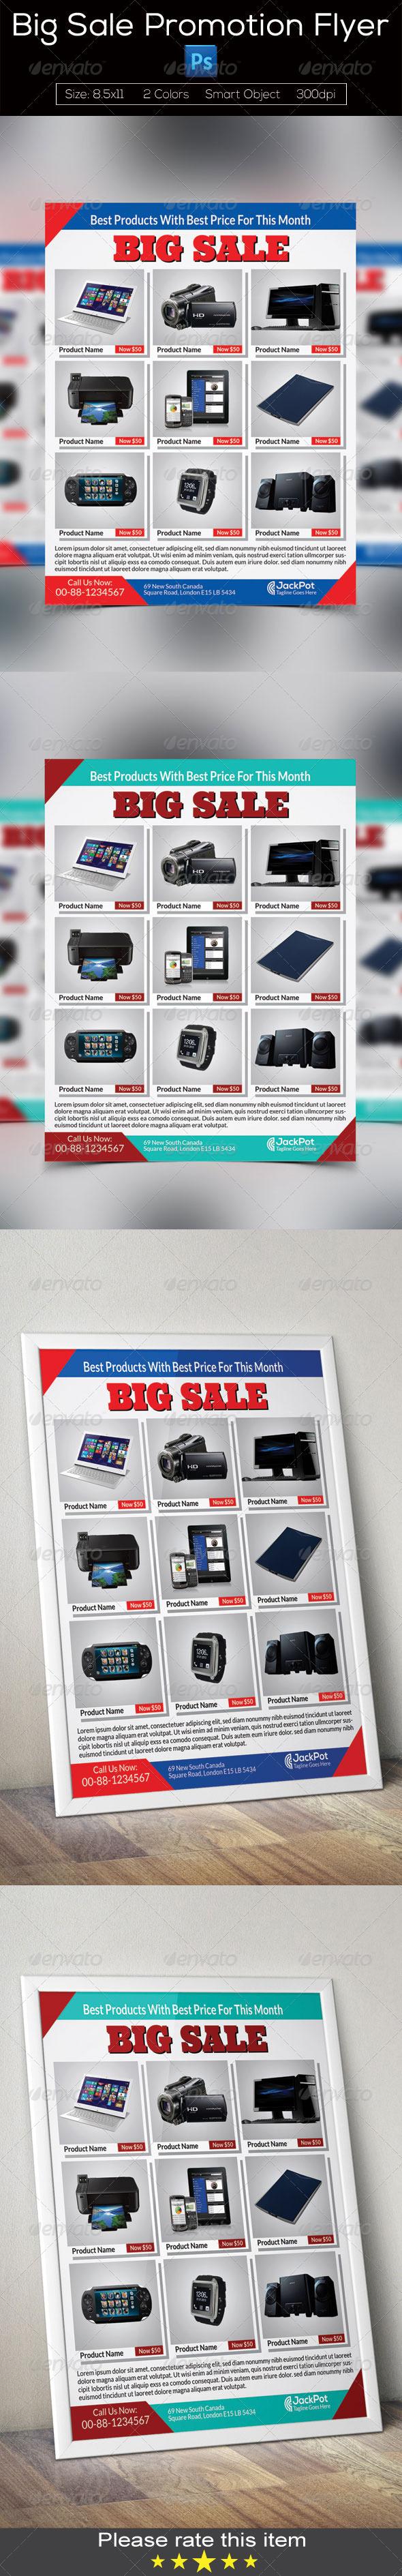 GraphicRiver Big Sale Promotion Flyer 7791680